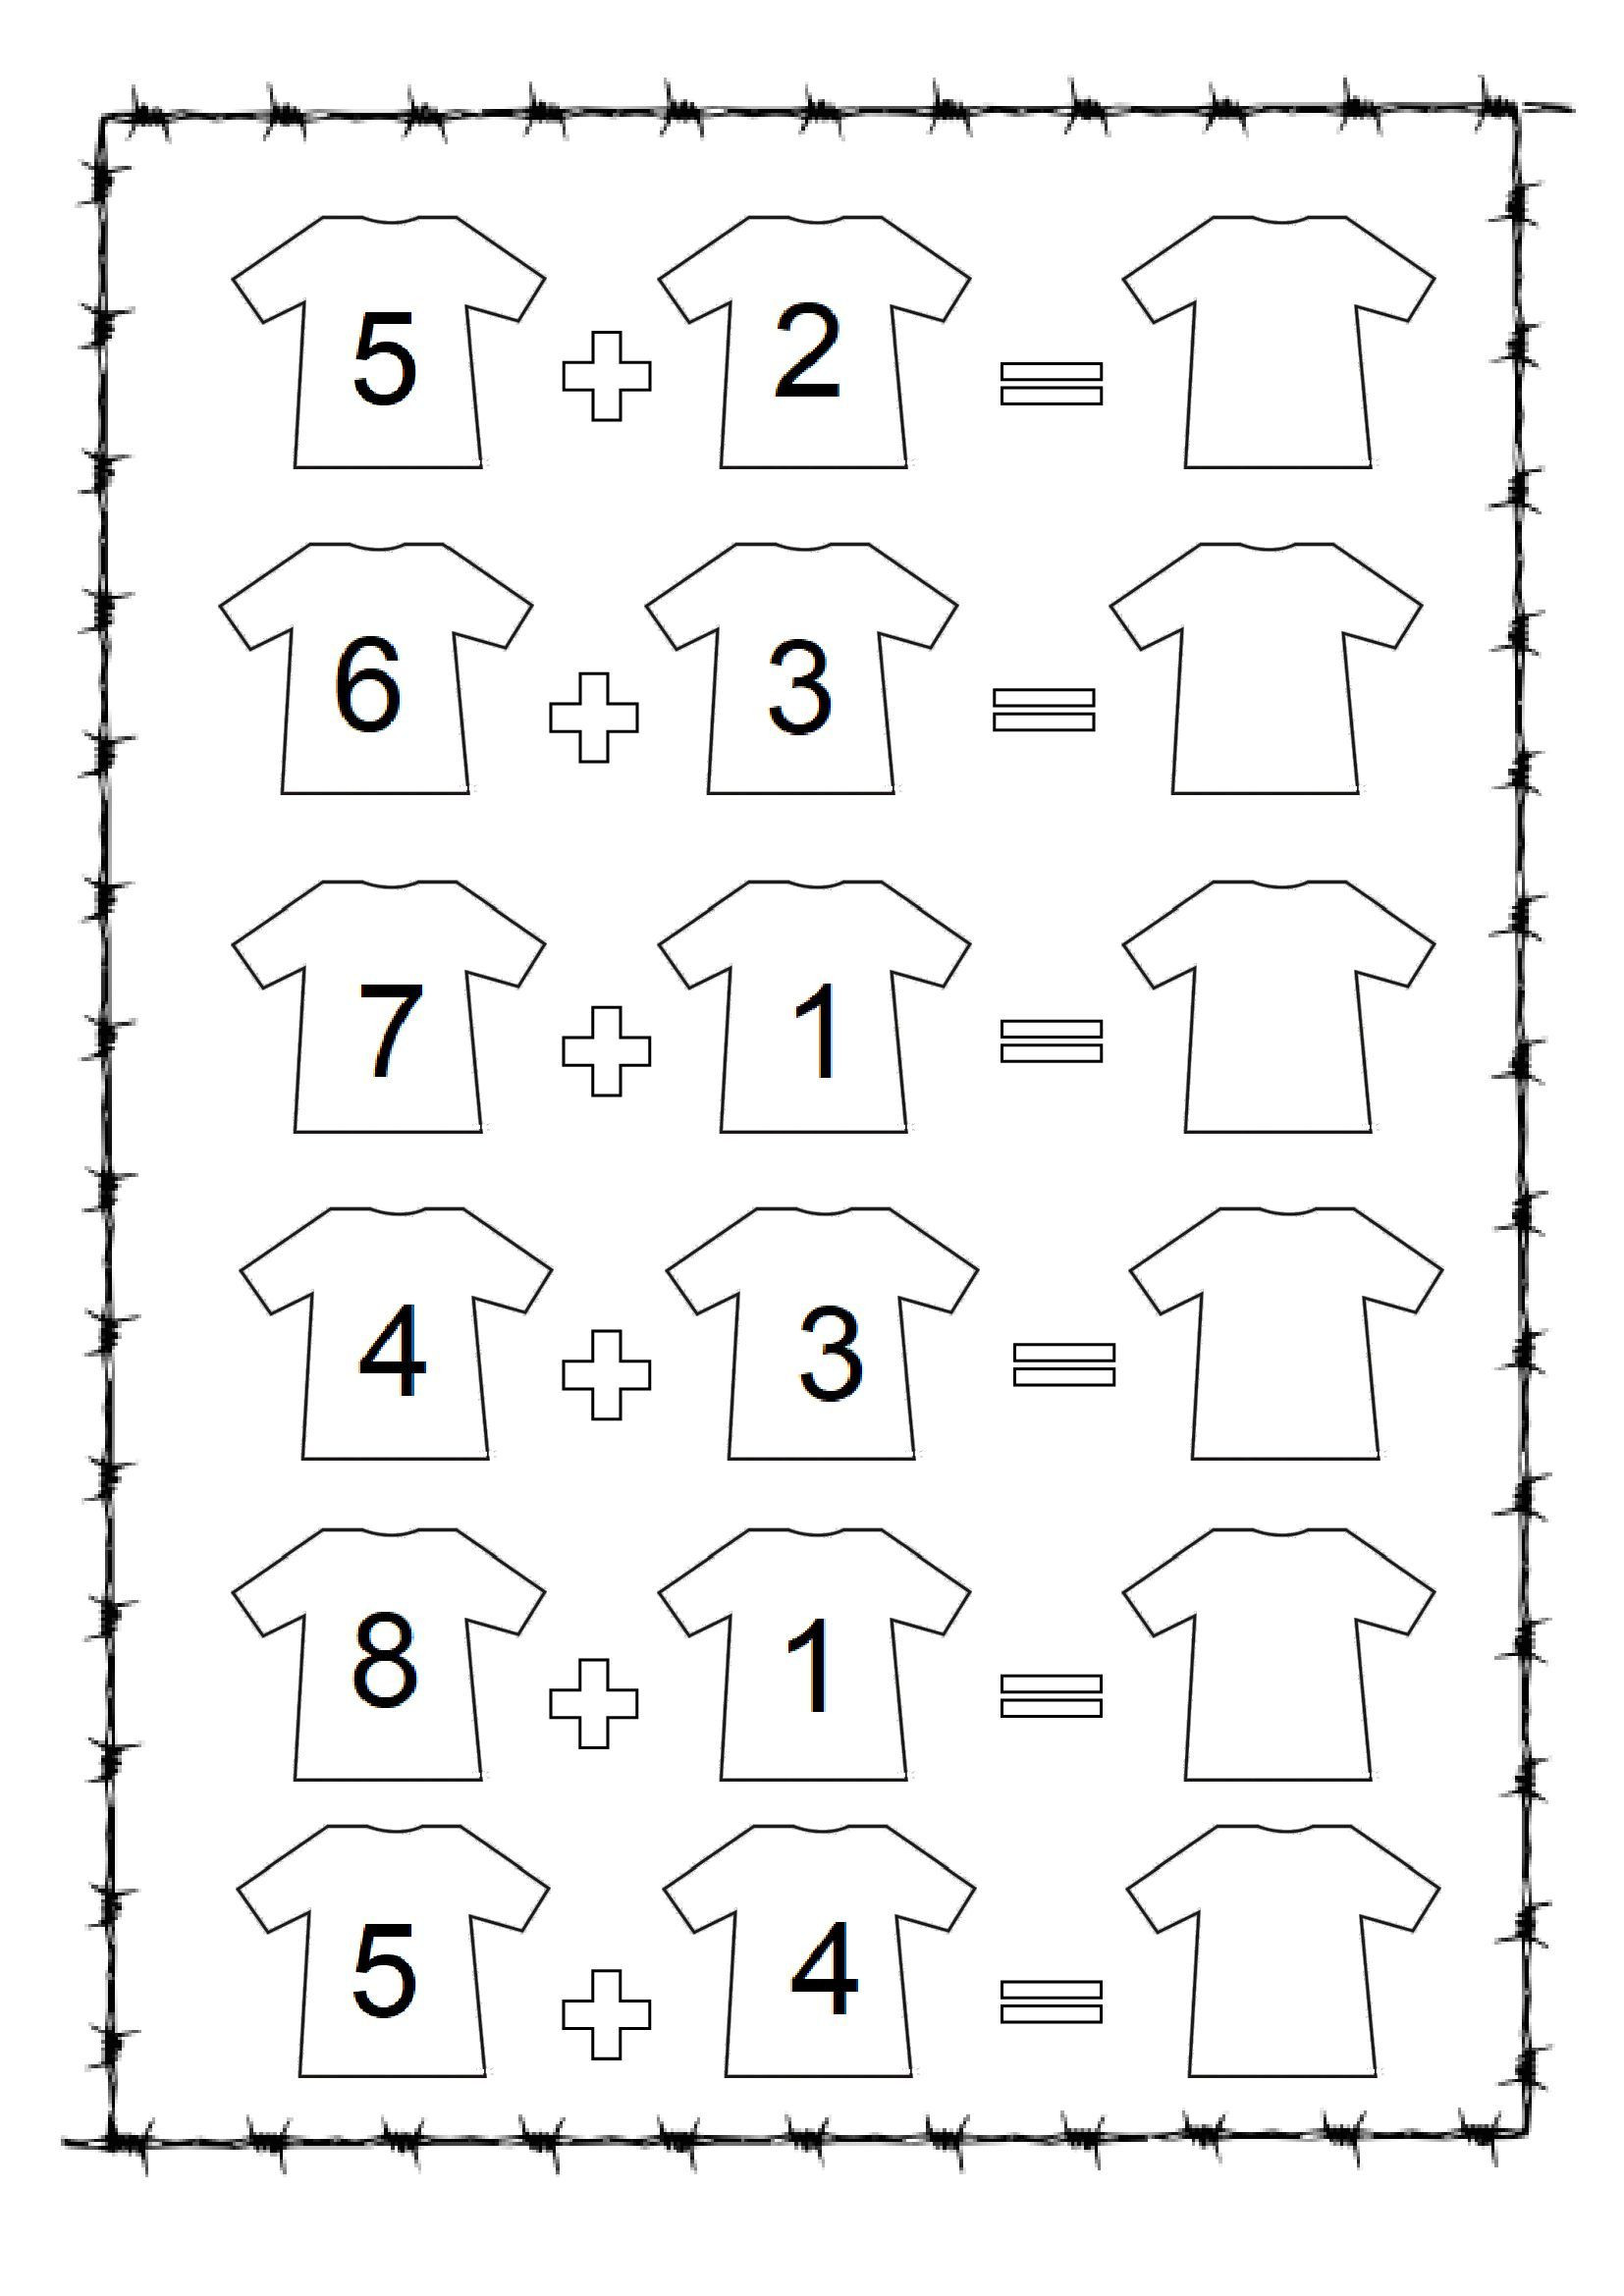 Kindergarten Math Worksheet Pdf Missing Number Worksheet Pdf Easy and Printable